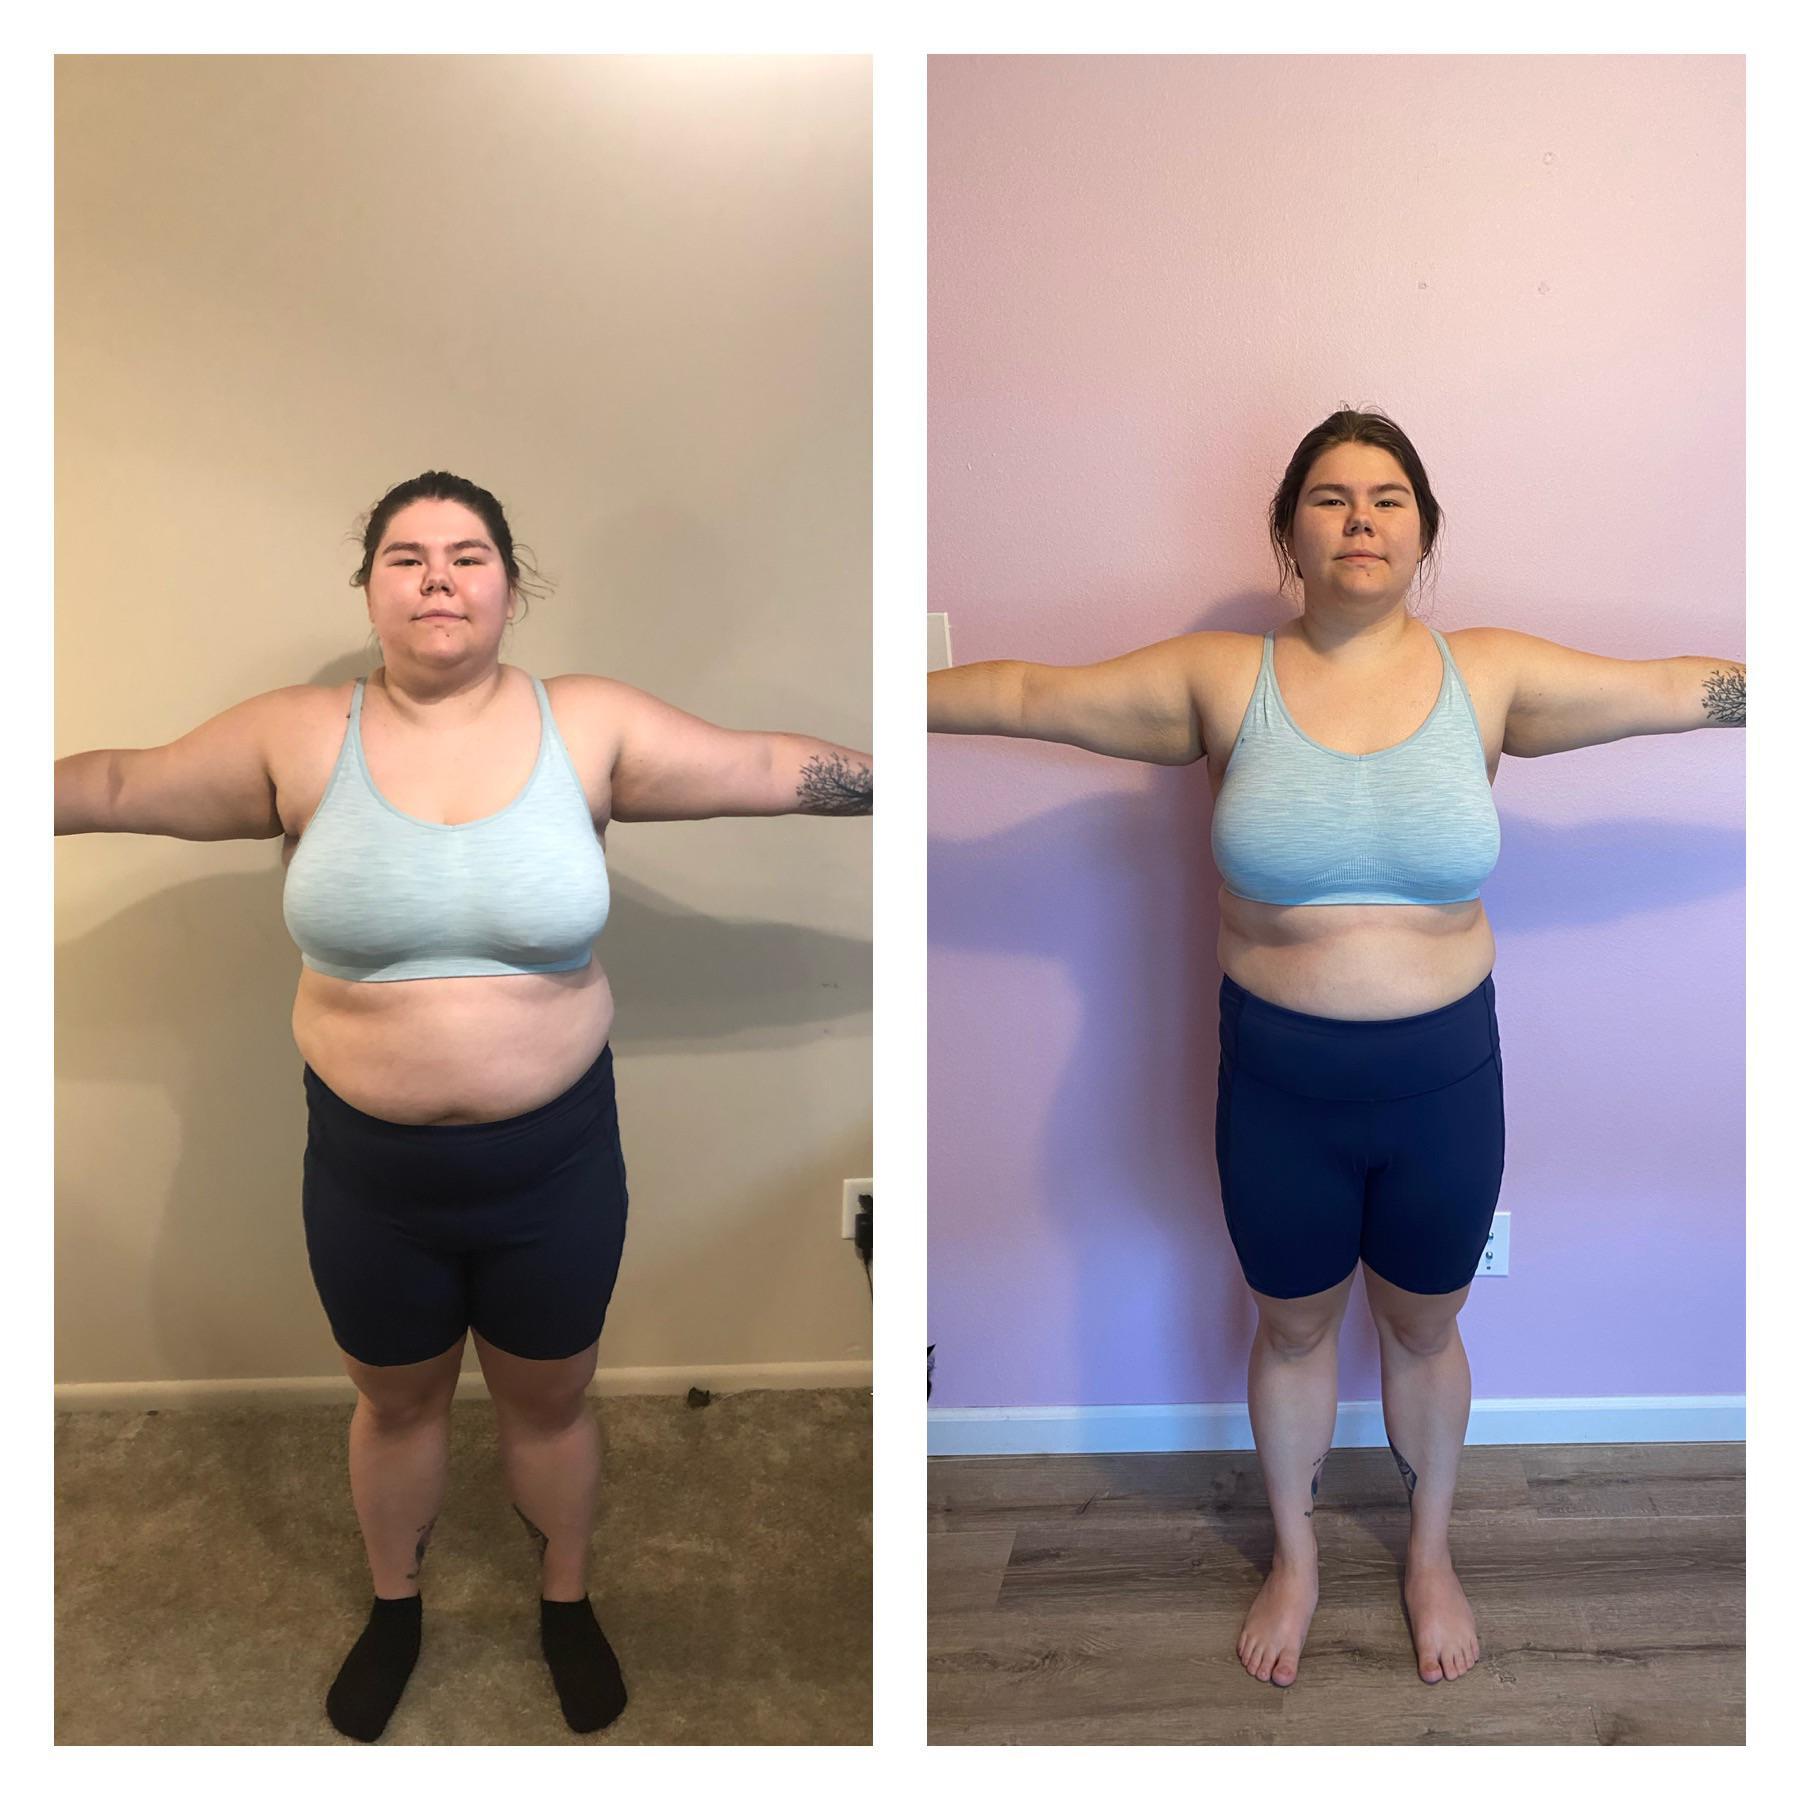 5'4 Female Progress Pics of 36 lbs Weight Loss 225 lbs to 189 lbs